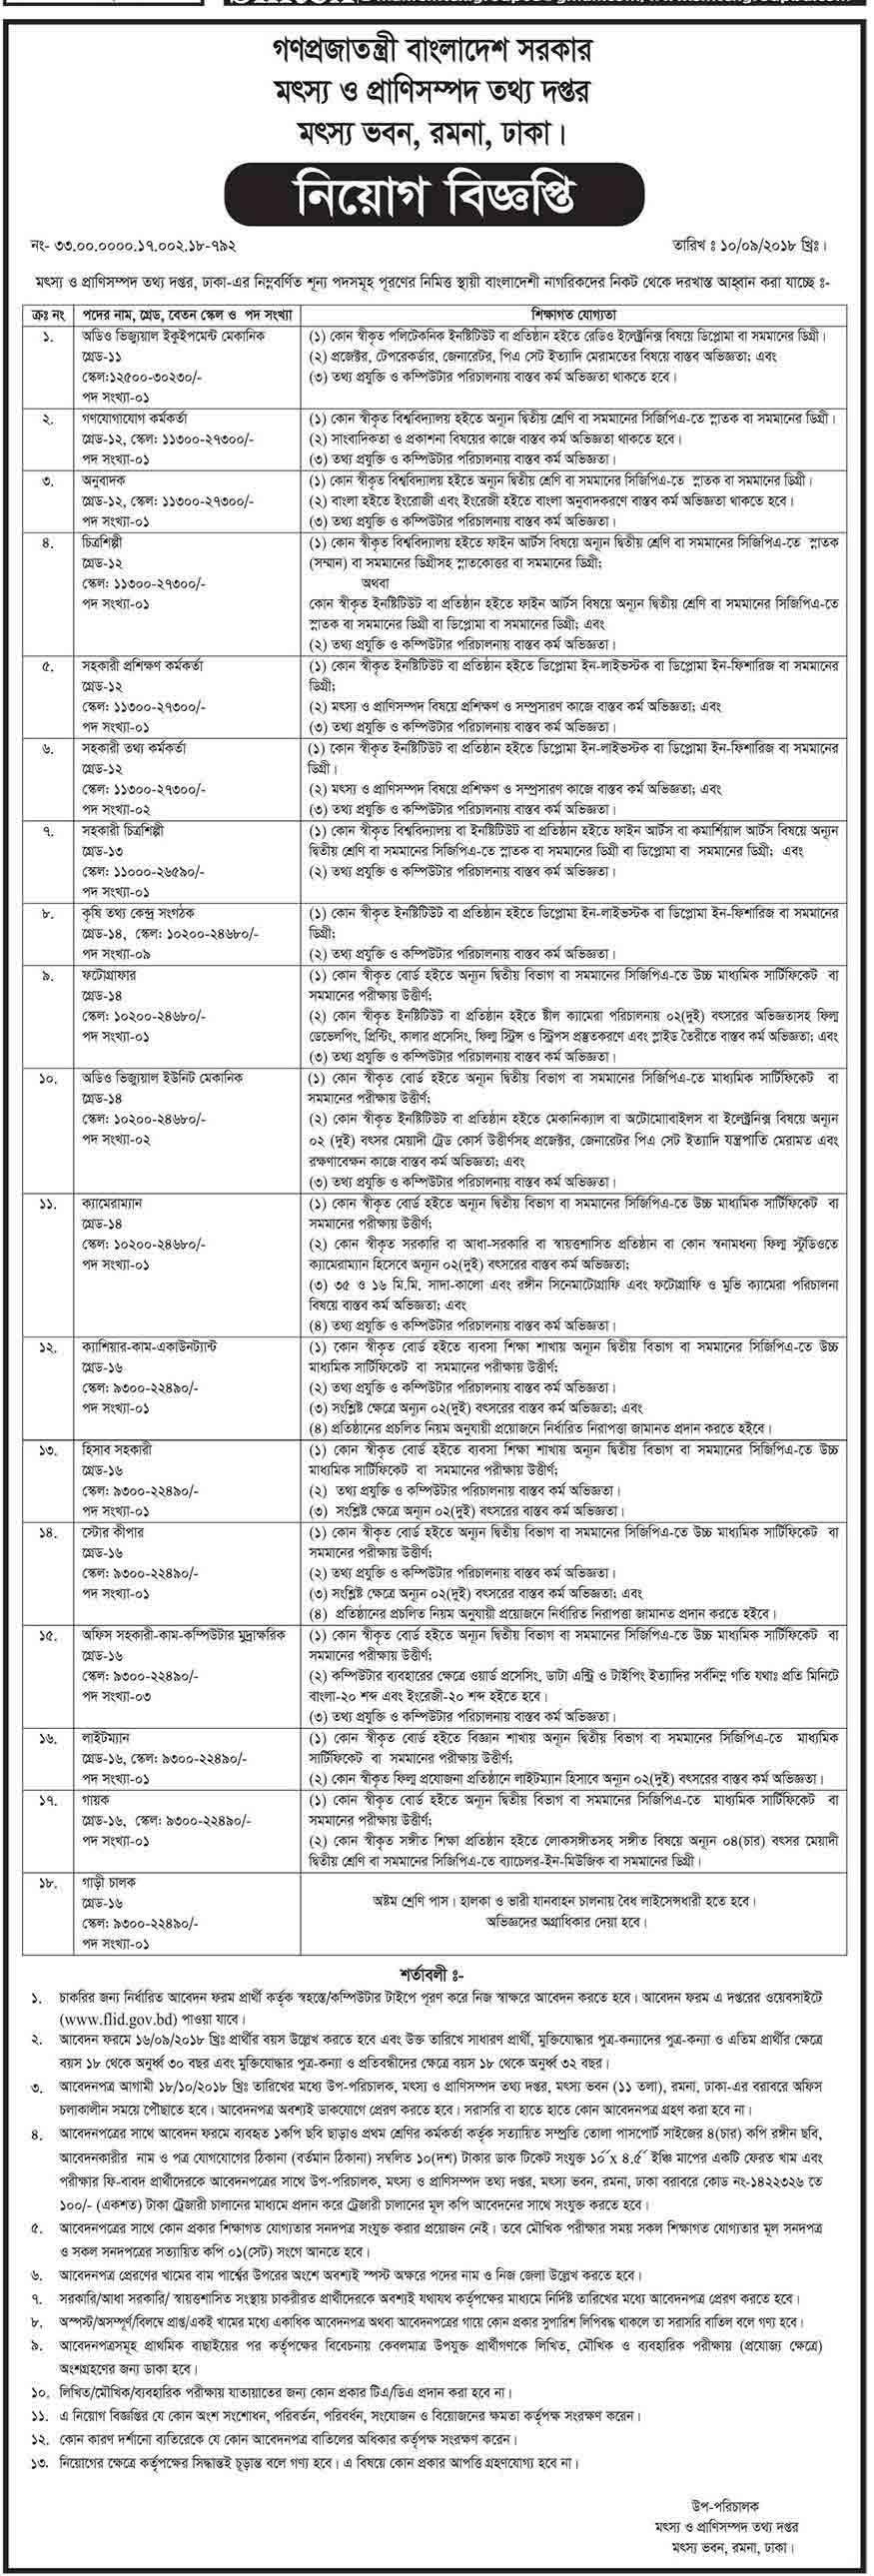 Department-of-Fisheries-and-Livestock-job-circular-2018